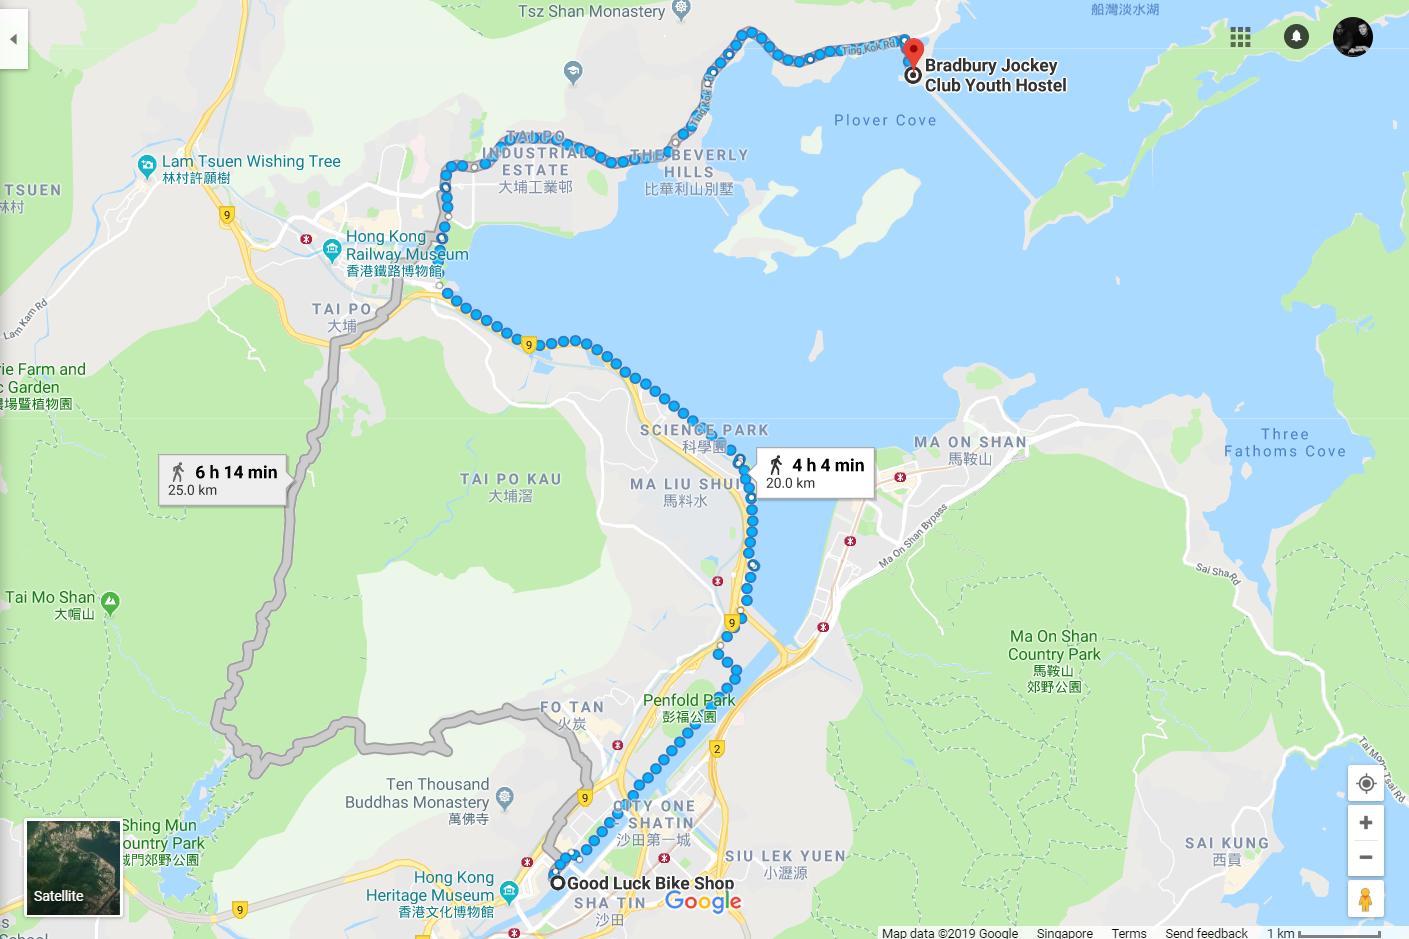 sha tin map - SUTD Shatin Hong Kong Map on australia map, canada map, mongolia map, malaysia map, singapore map, angkor map, world map, taiwan map, korea map, china map, kowloon street map, israel map, kuwait map, colombia map, asia map, tsim sha tsui map, india map, global map, macau map, japan map,